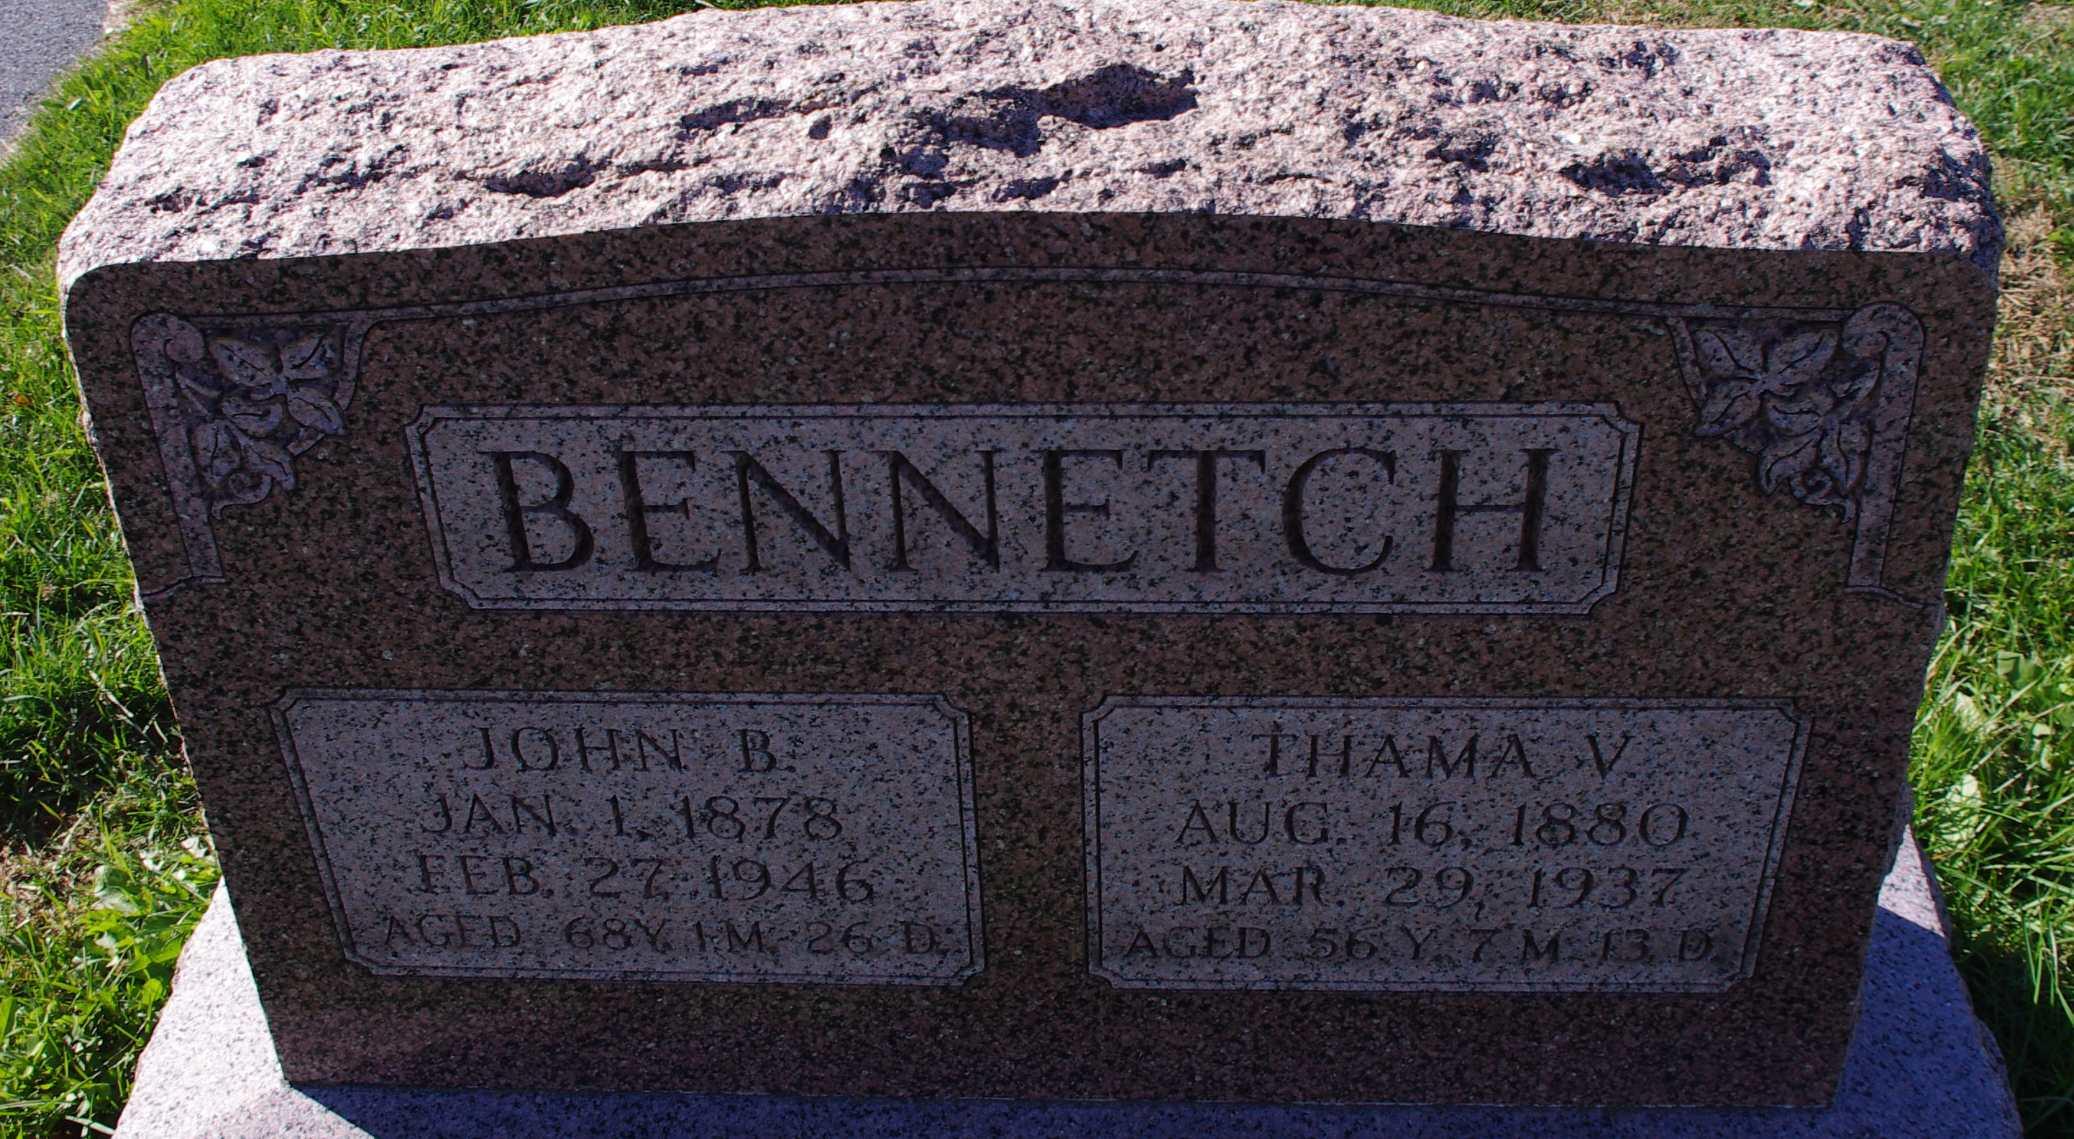 John B Bennetch